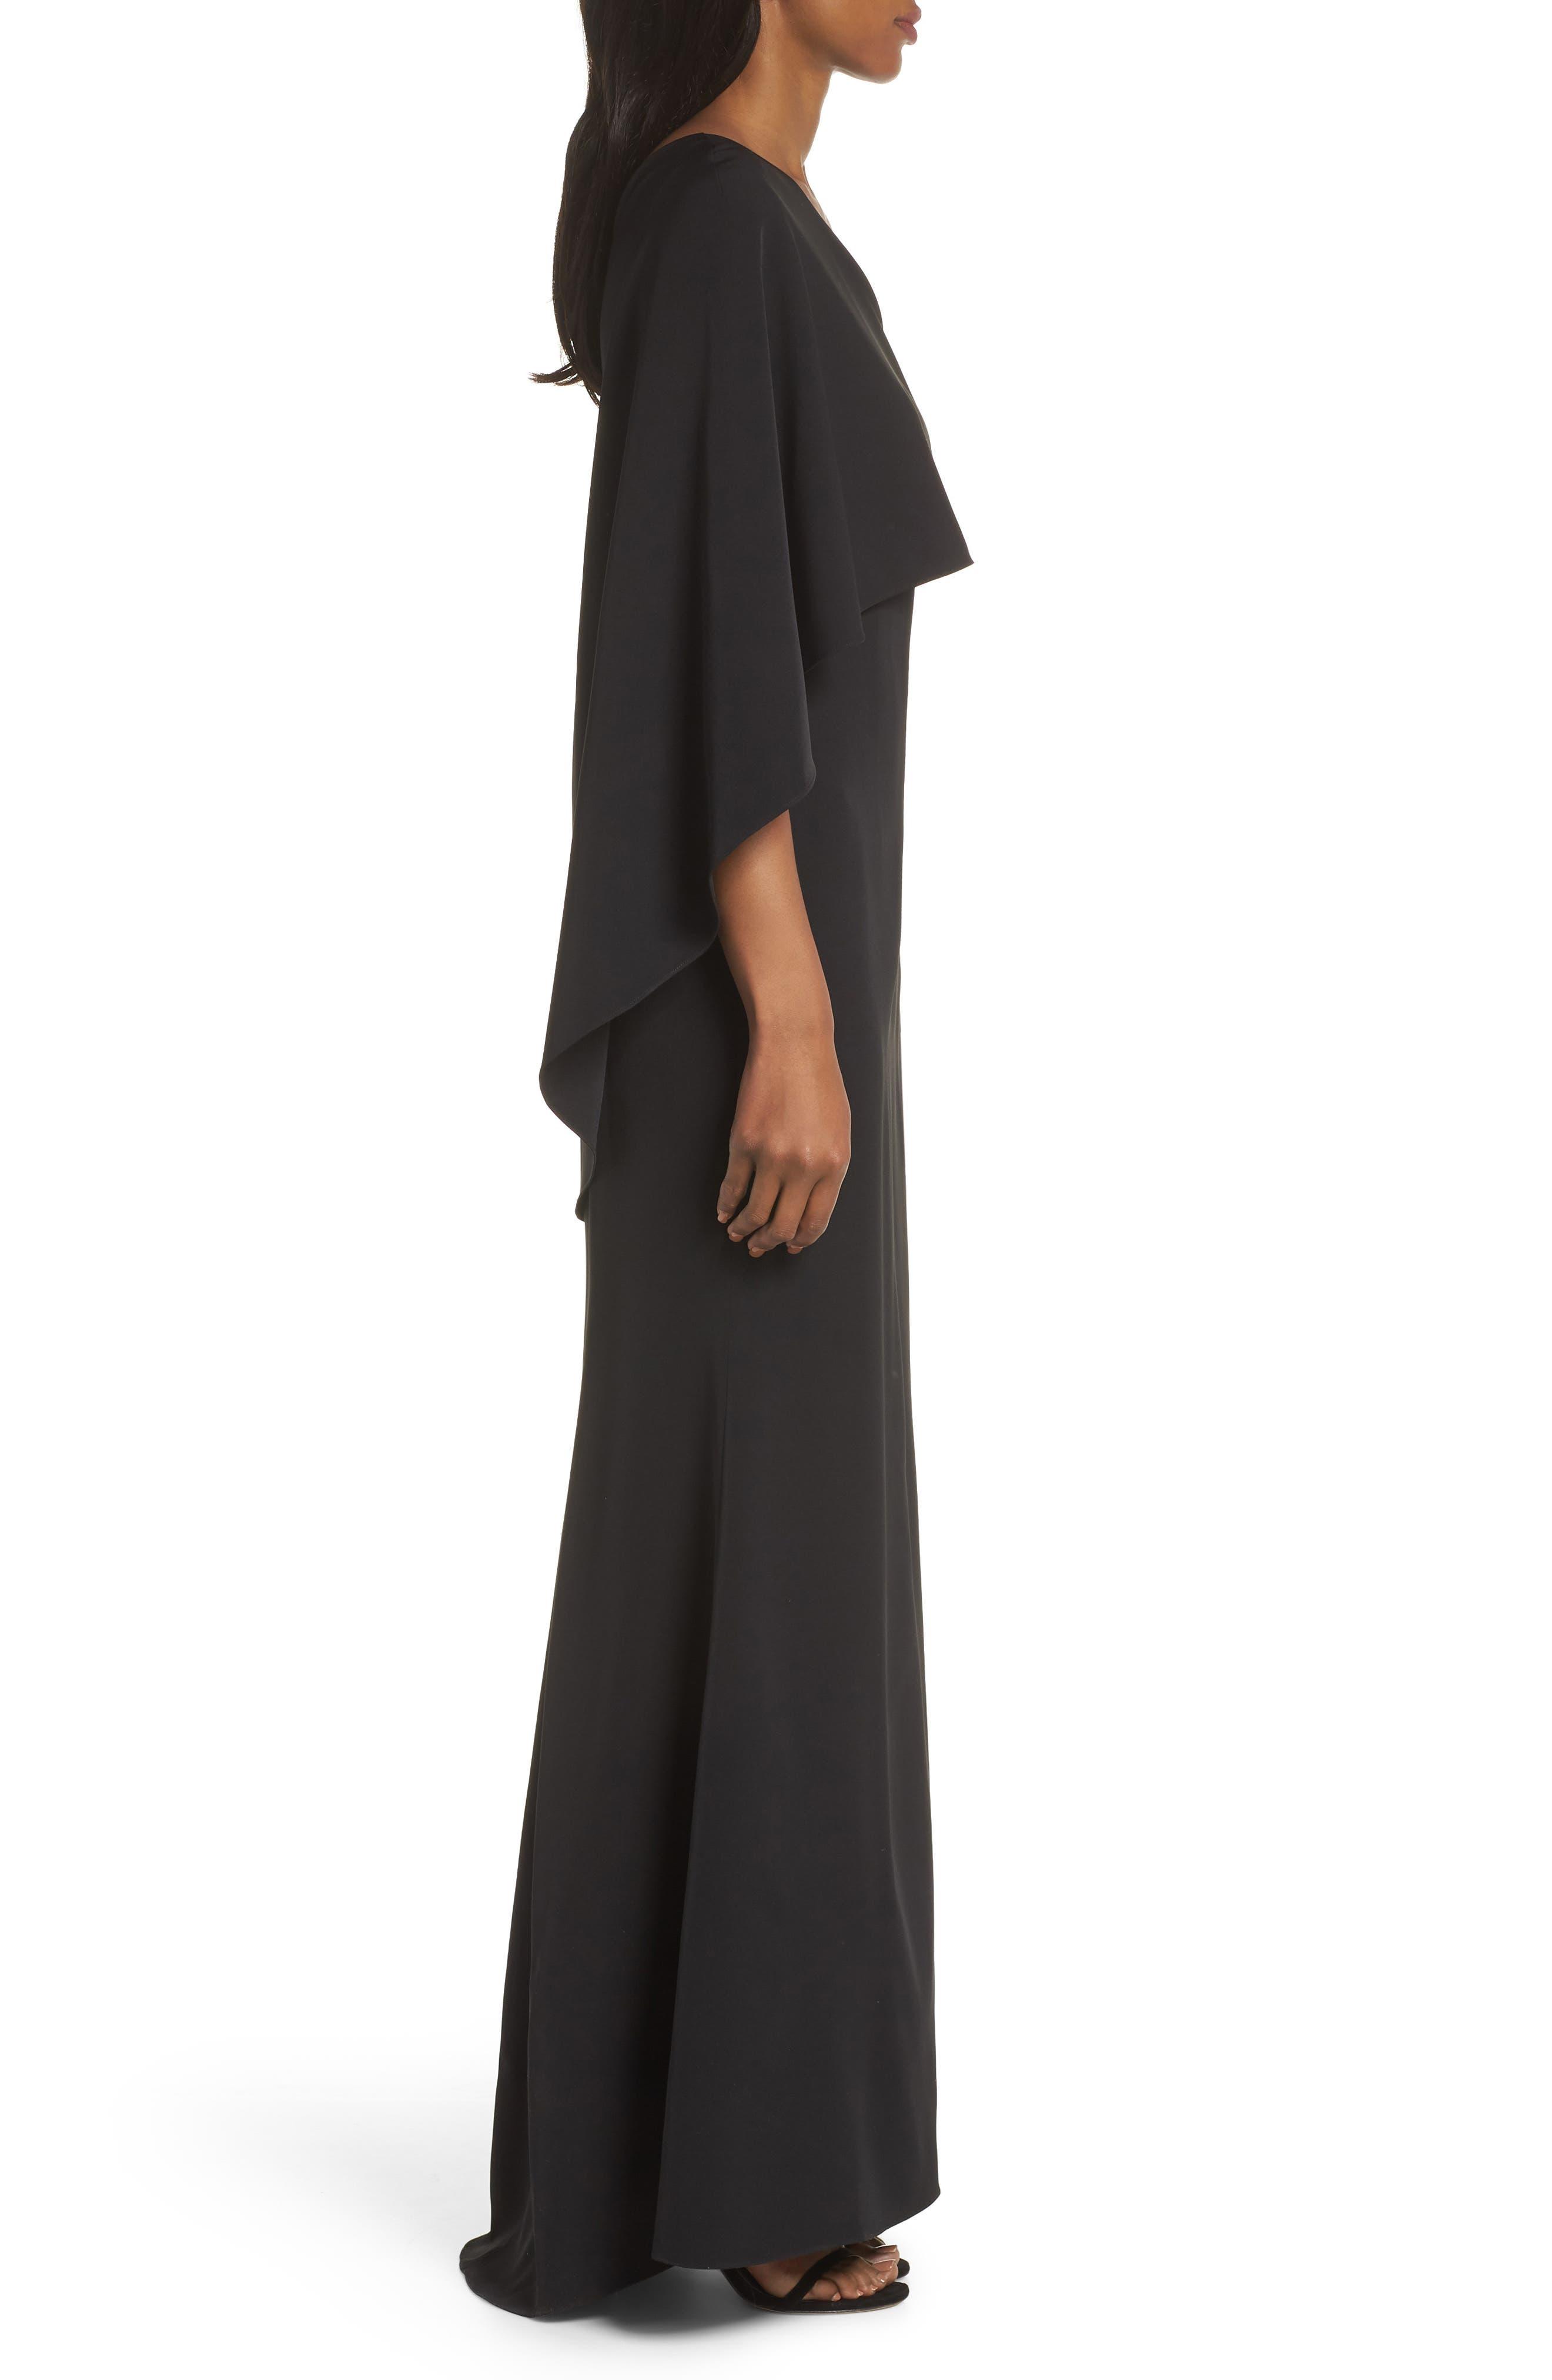 VINCE CAMUTO, One-Shoulder Cape Evening Dress, Alternate thumbnail 4, color, BLACK